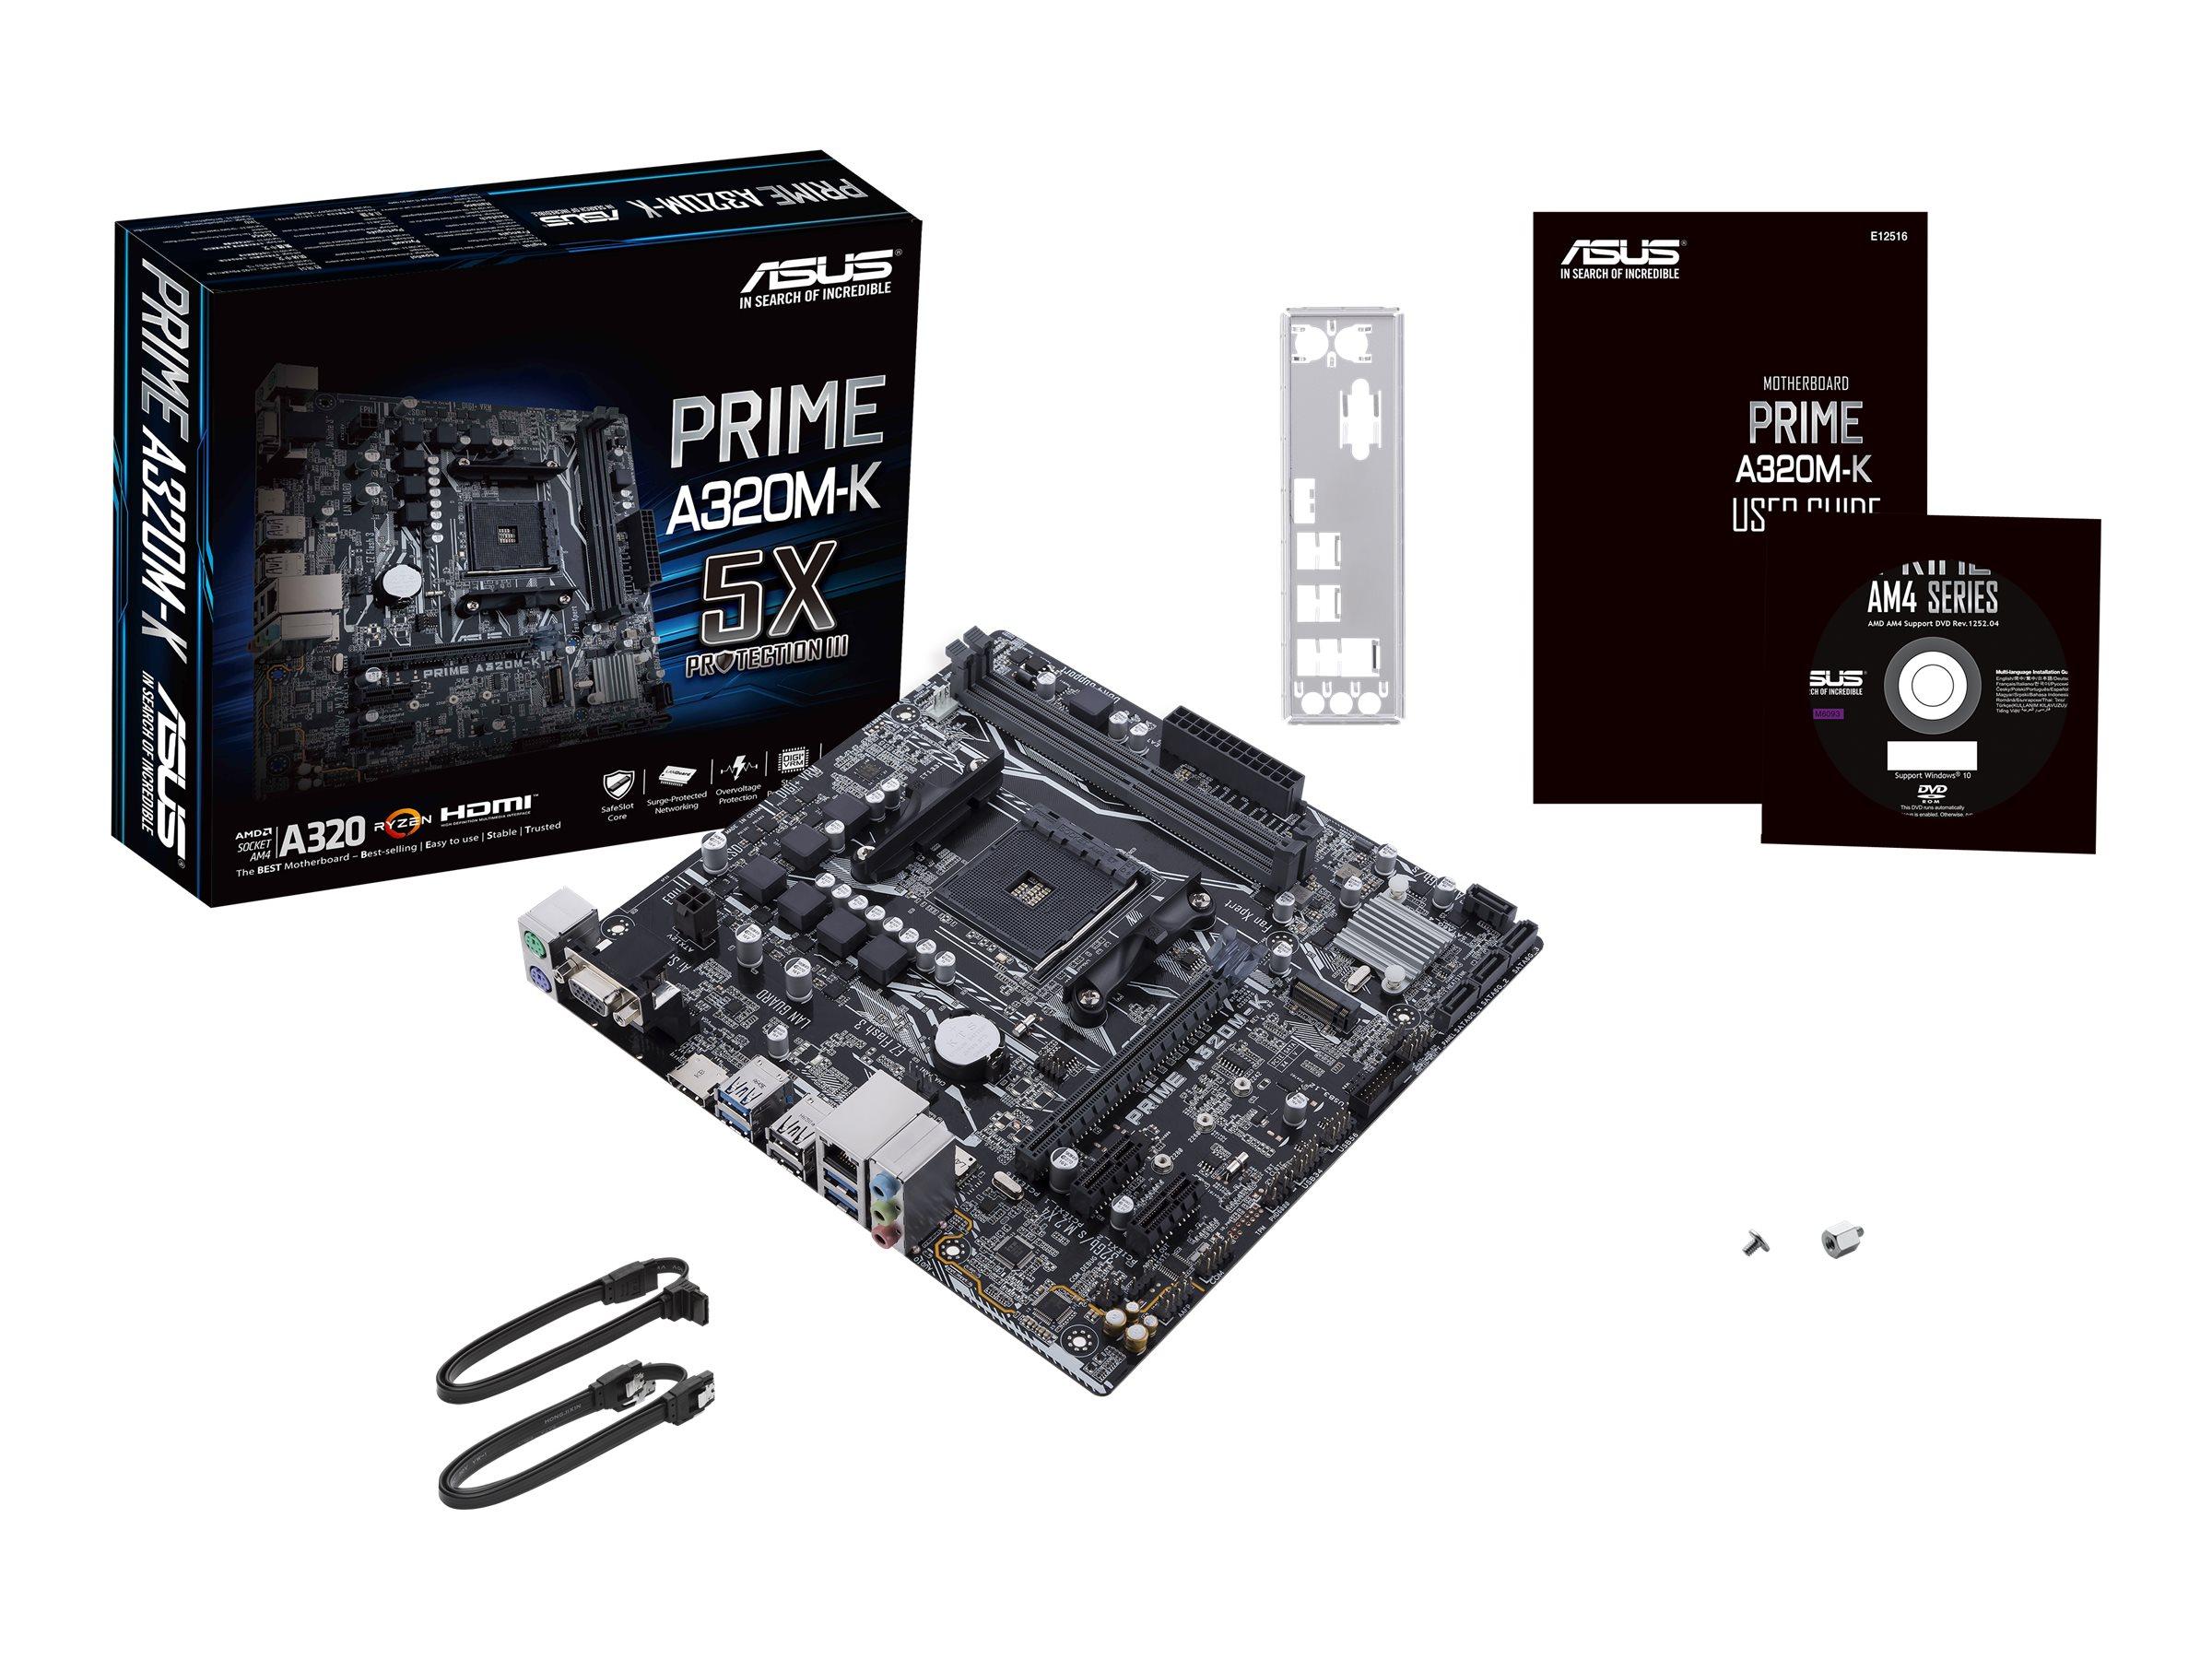 ASUS PRIME A320M-K - Motherboard - micro ATX - Socket AM4 - AMD A320 - USB 3.0